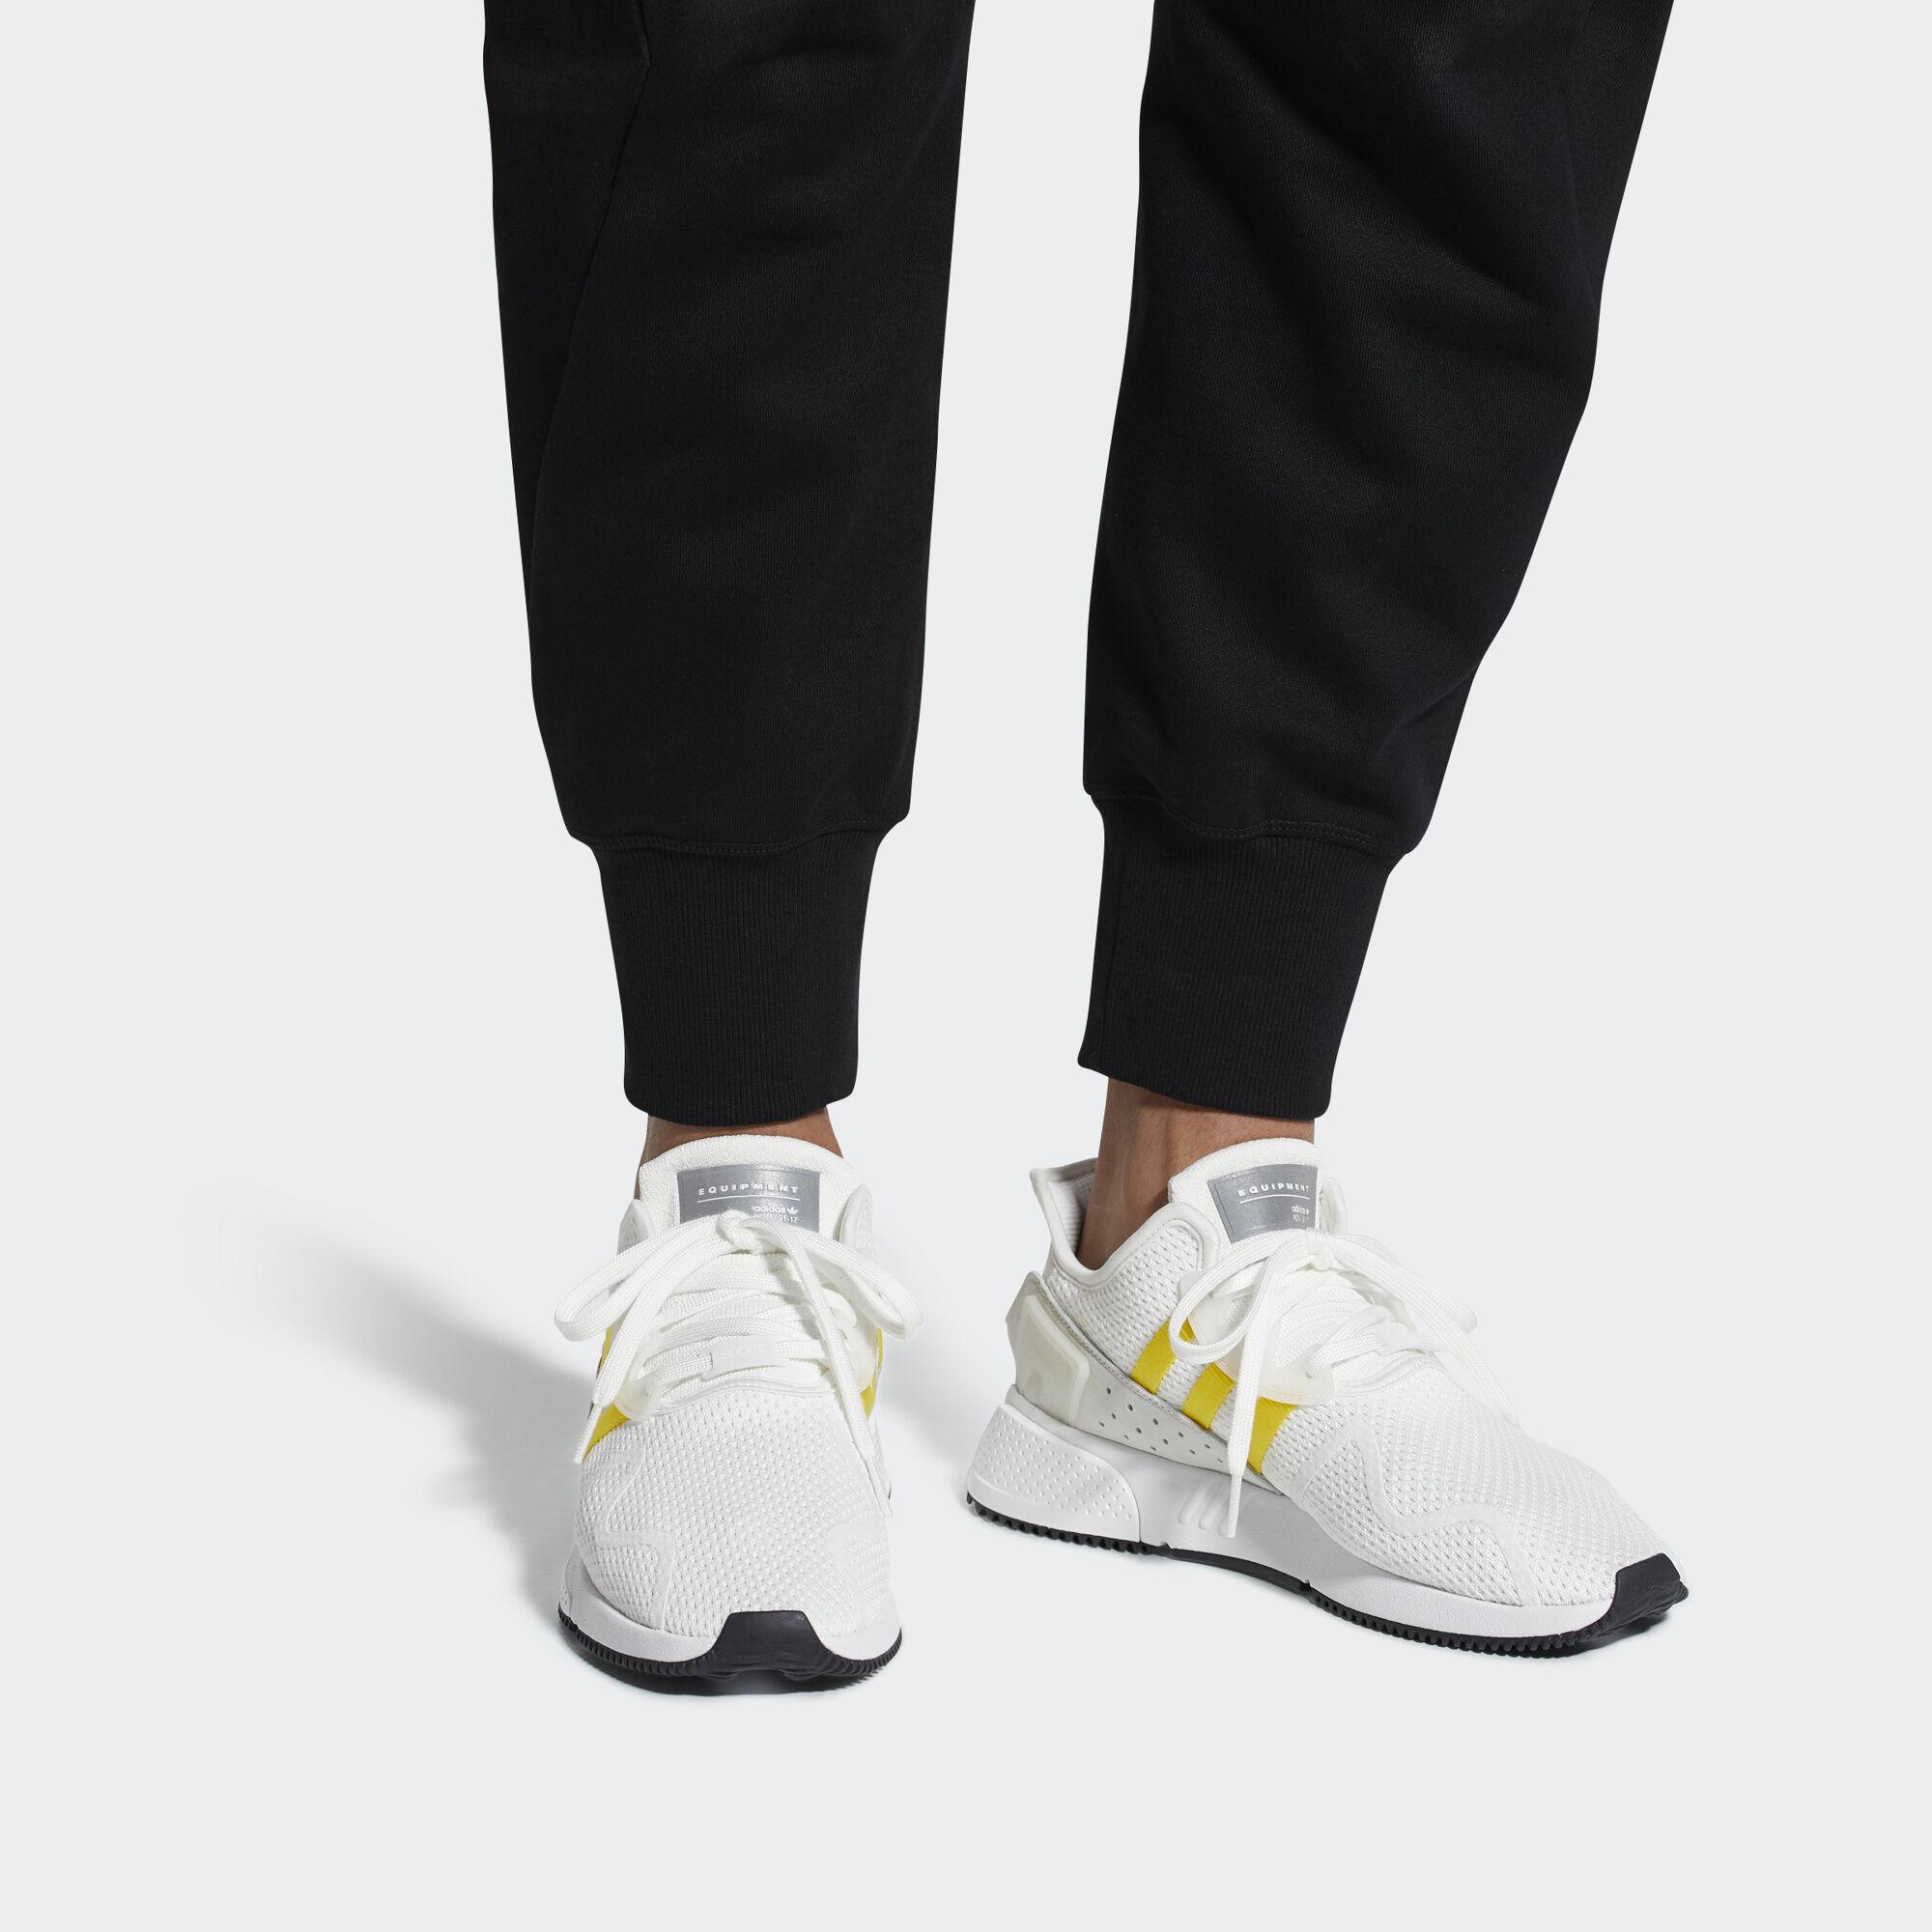 adidas Sapatos EQT Cushion ADV - Azul  7442f0b23fe54